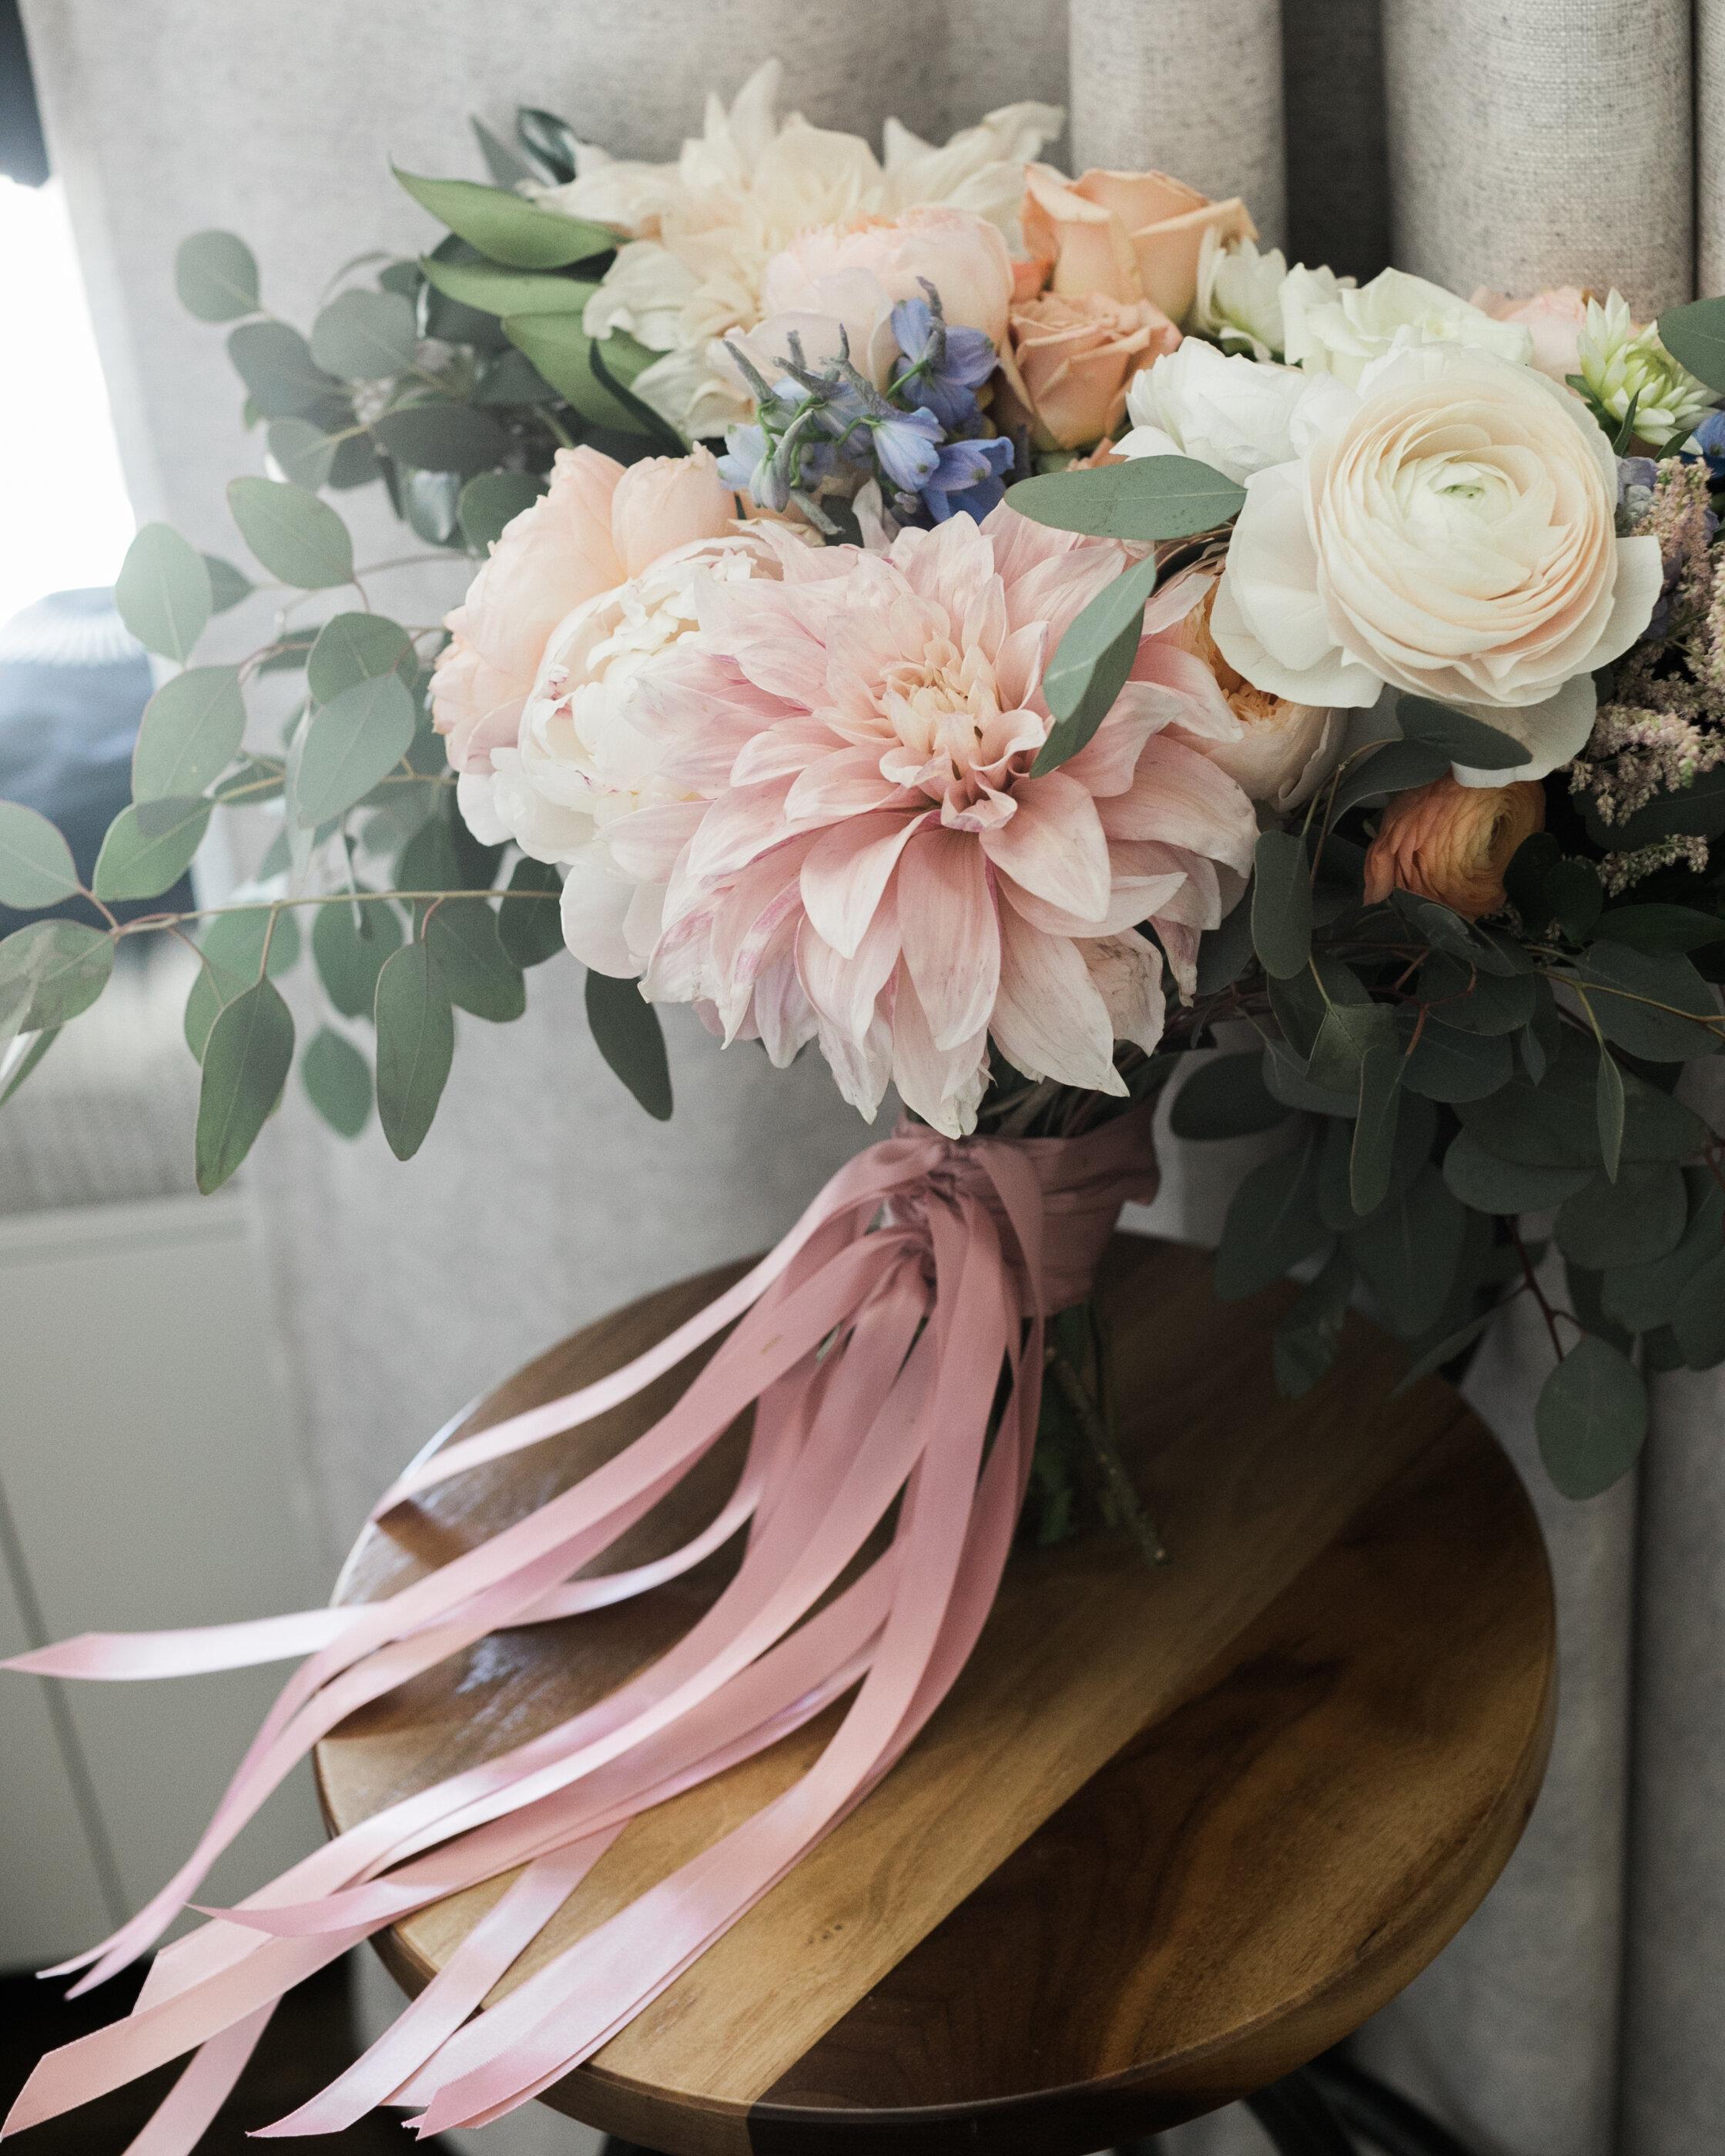 ivory-and-beau-blog-weddings-ivory-and-beau-couple-dominique-and-andres-savannah-florist-wedding-planning-savannah-bridal-boutique-wedding-flowers-KIP_WEBERWEDDING_RAILROADMUSEUM-107.JPG